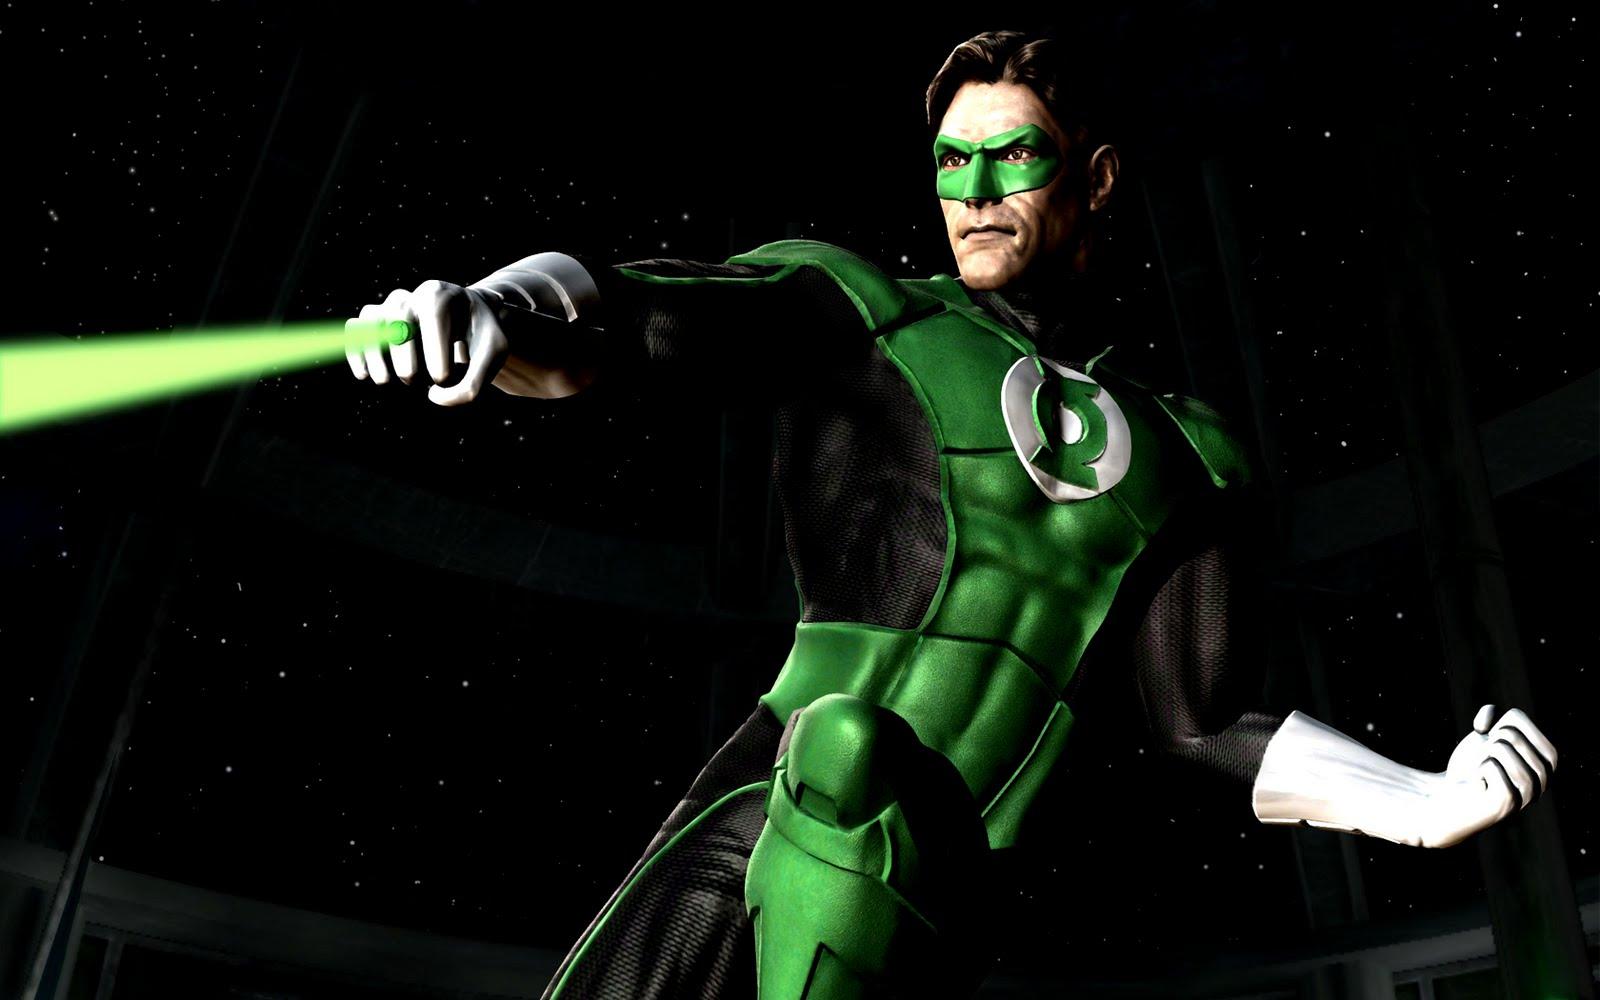 Green Lantern HD Logo and Wallpapers Cartoon Wallpapers 1600x1000